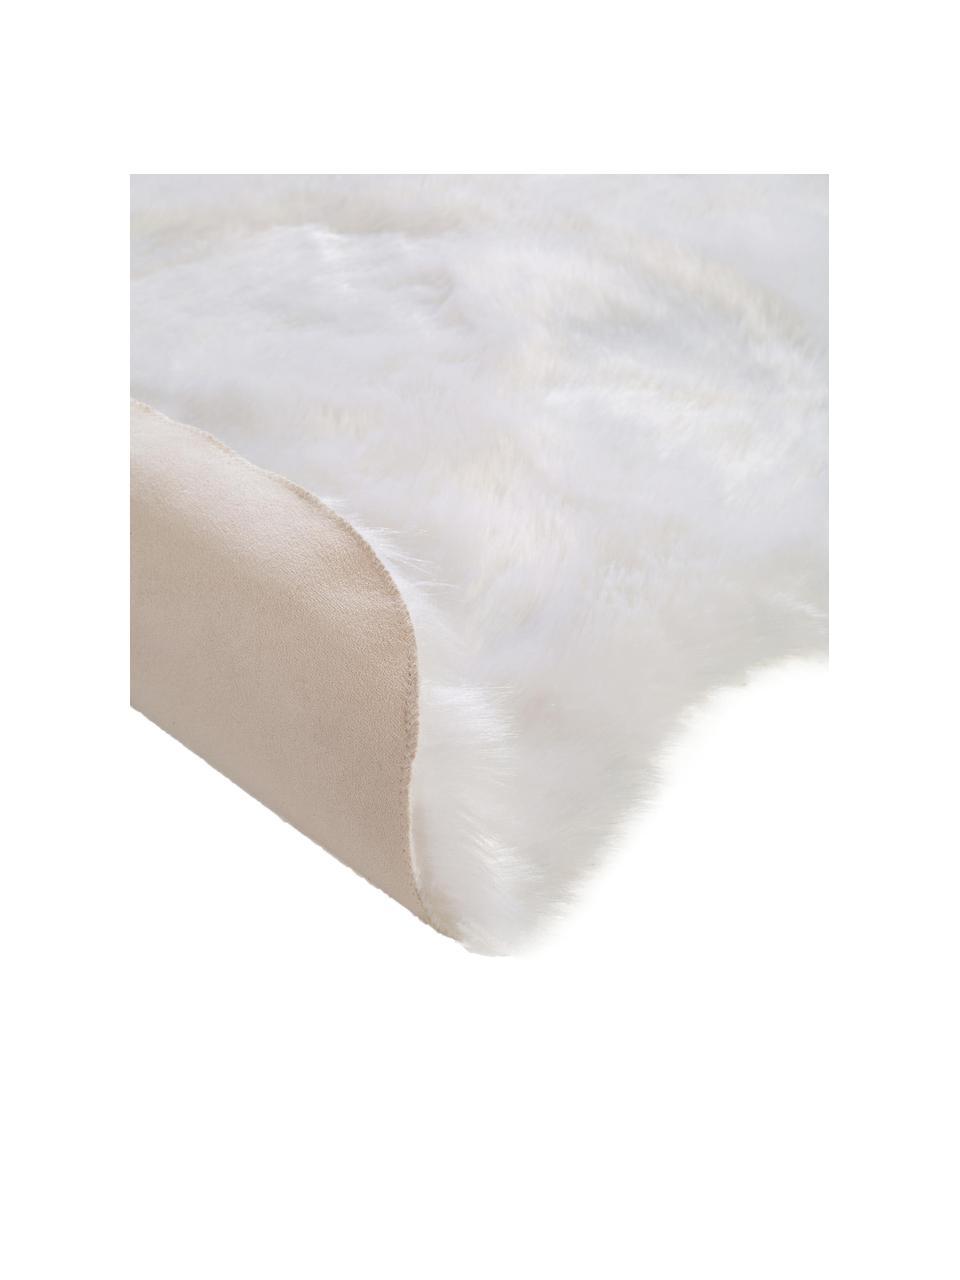 Pluizige imitatie schapenvacht Elmo in wit, glad, Bovenzijde: 50% acryl, 50% polyester, Onderzijde: polyester, Wit, B 140 x L 200 cm (maat S)